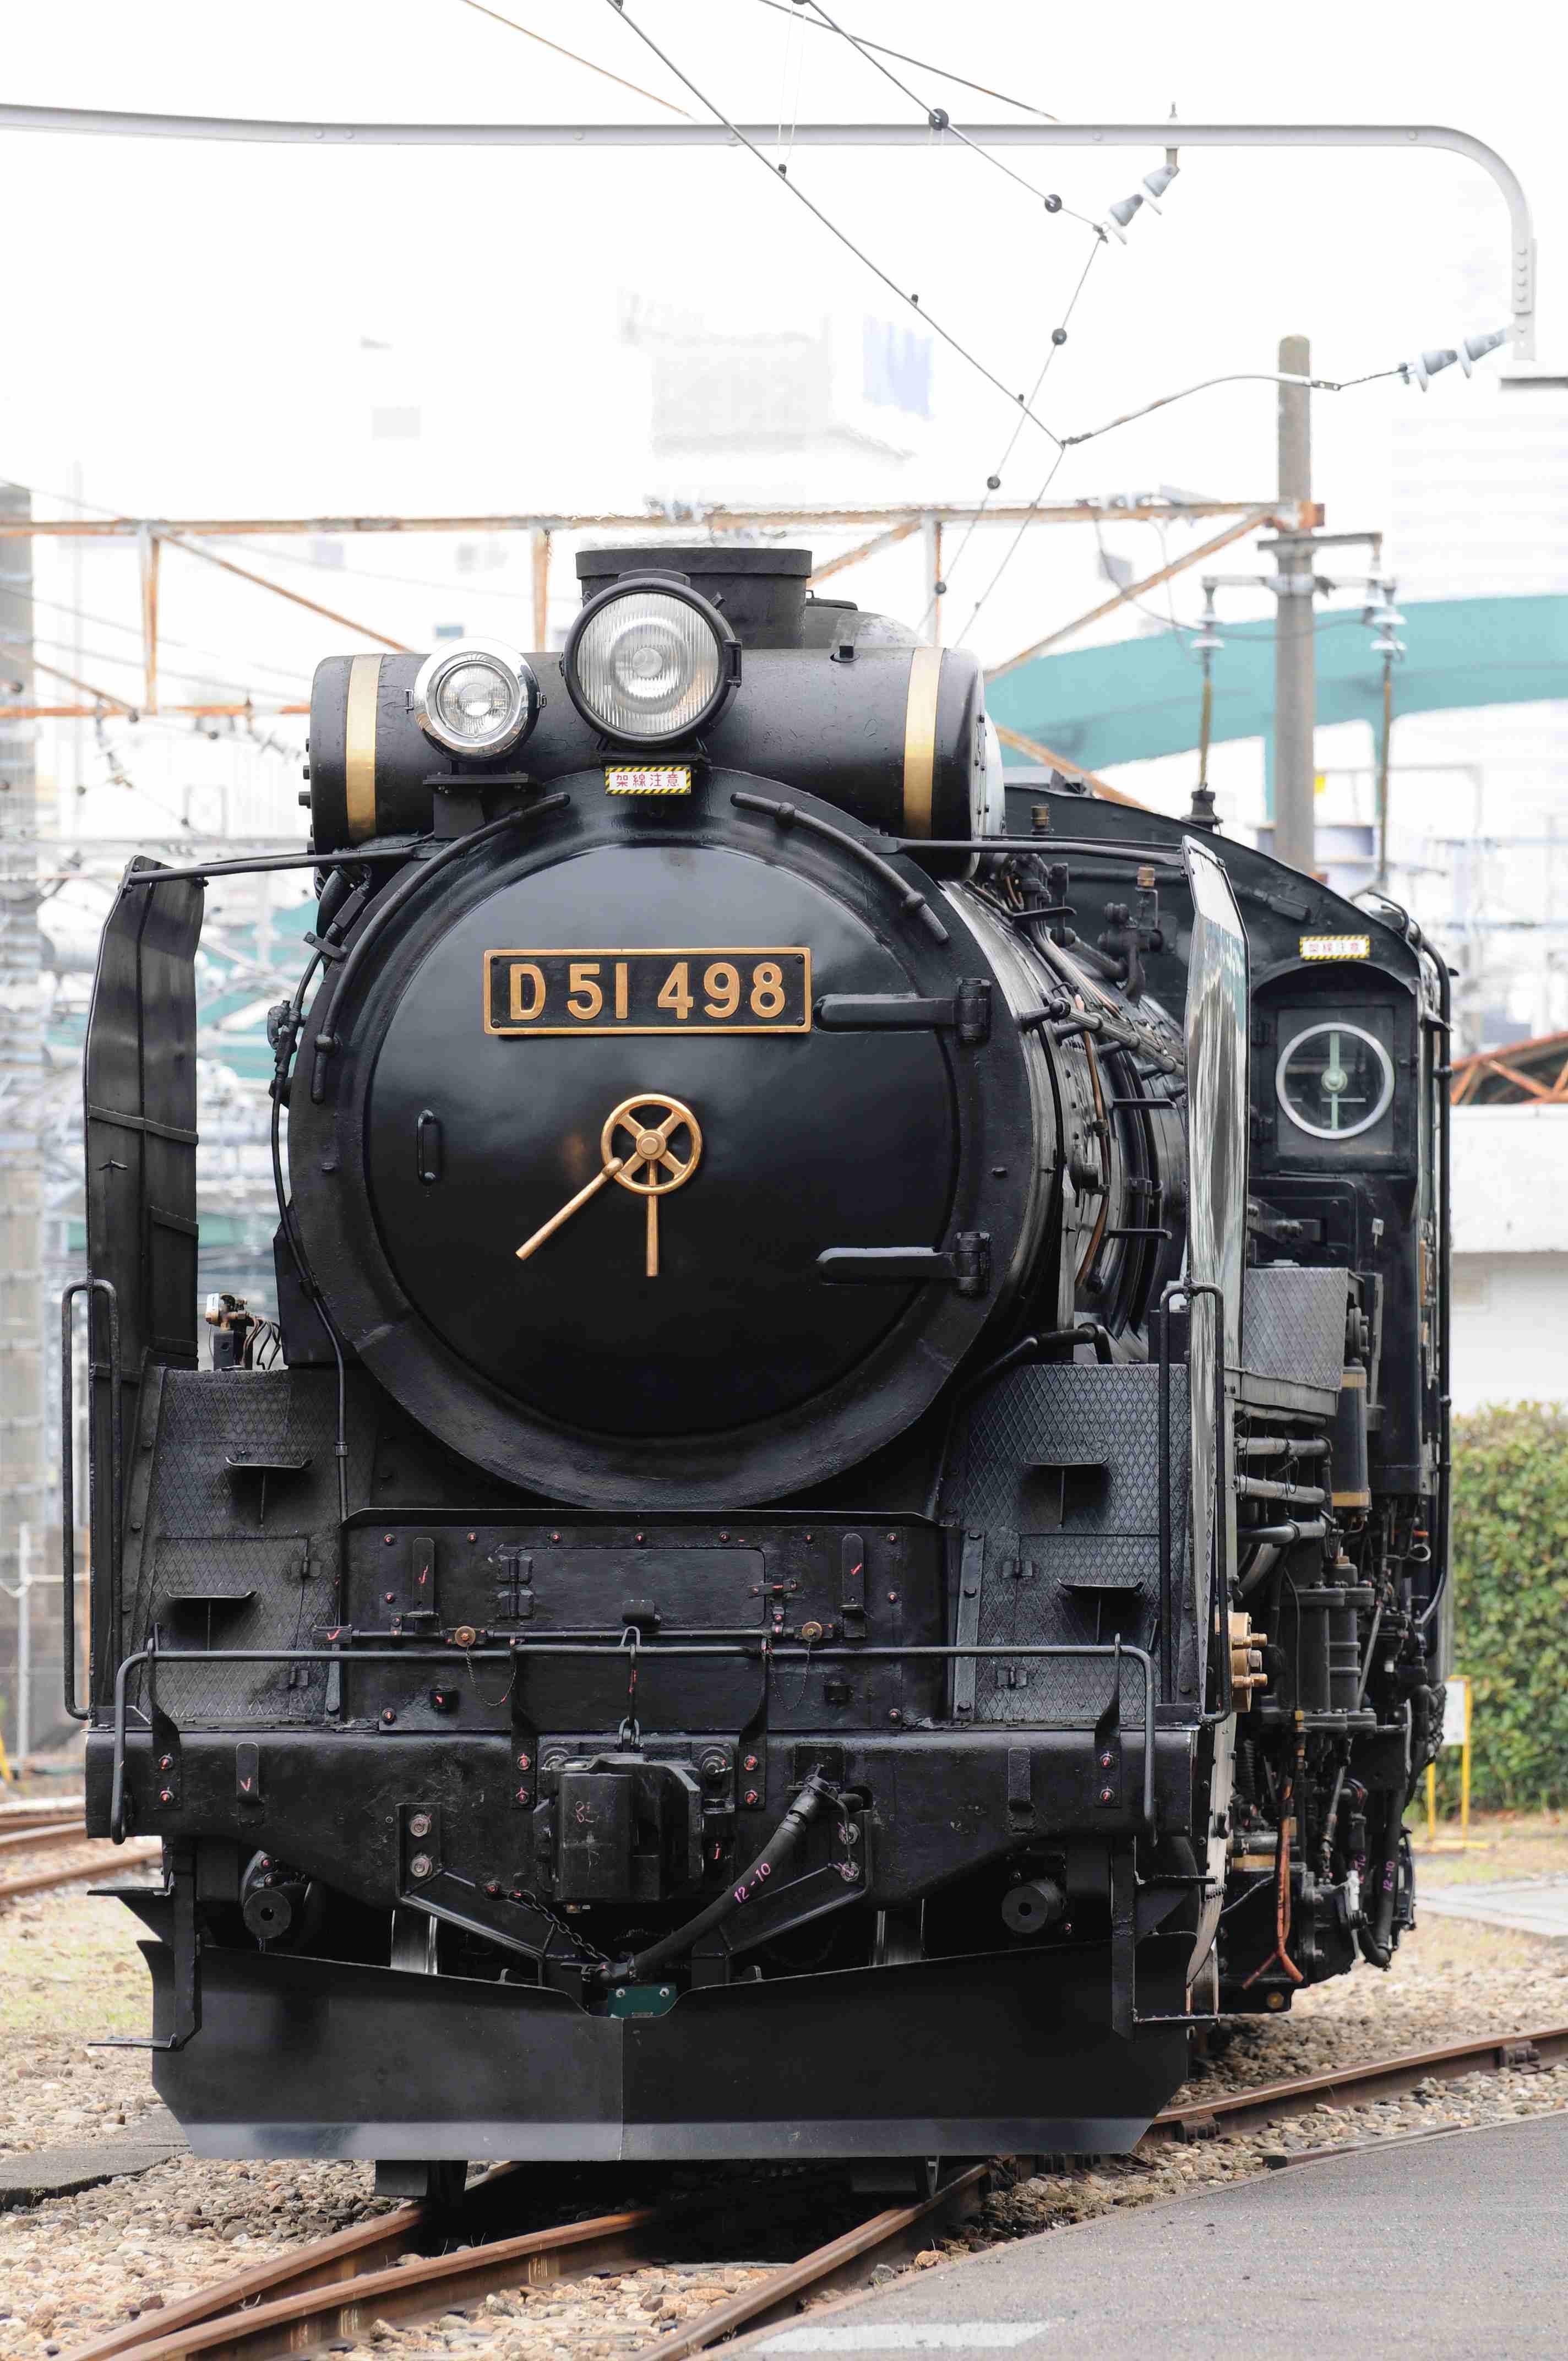 DSC_7074-1.jpg